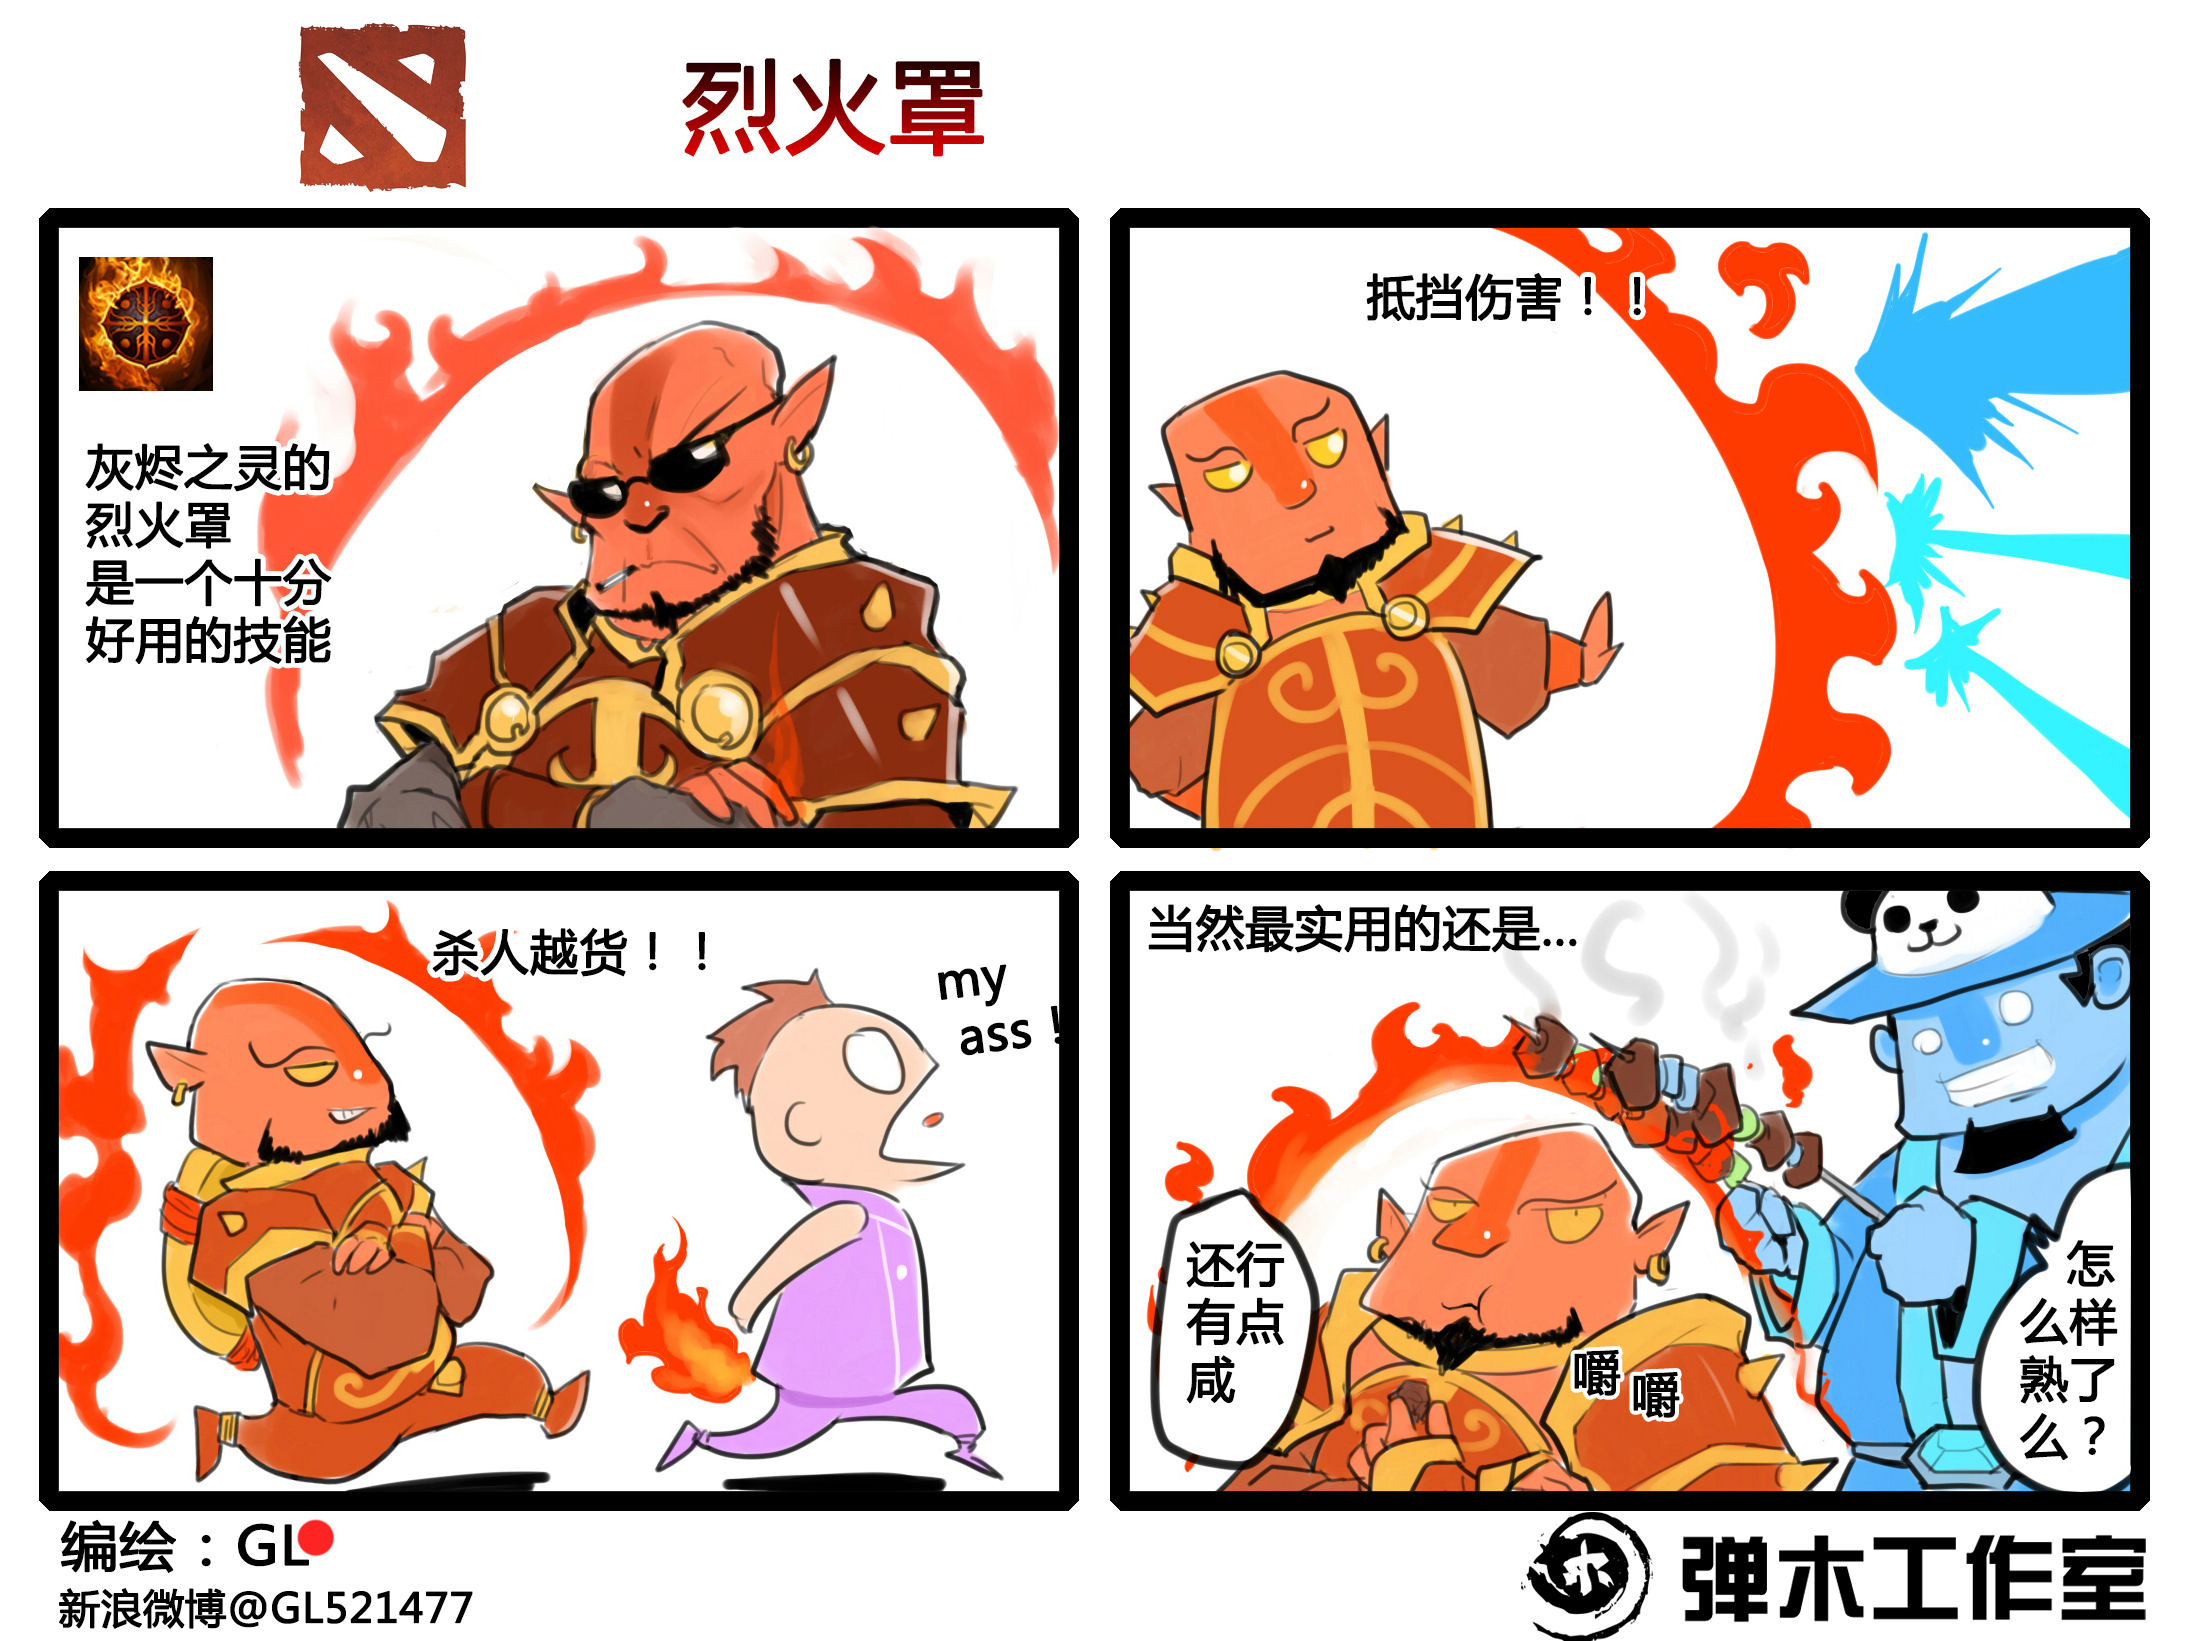 dota2搞笑漫画_肉山黑名单 dota2火猫大叔爆笑四格漫画